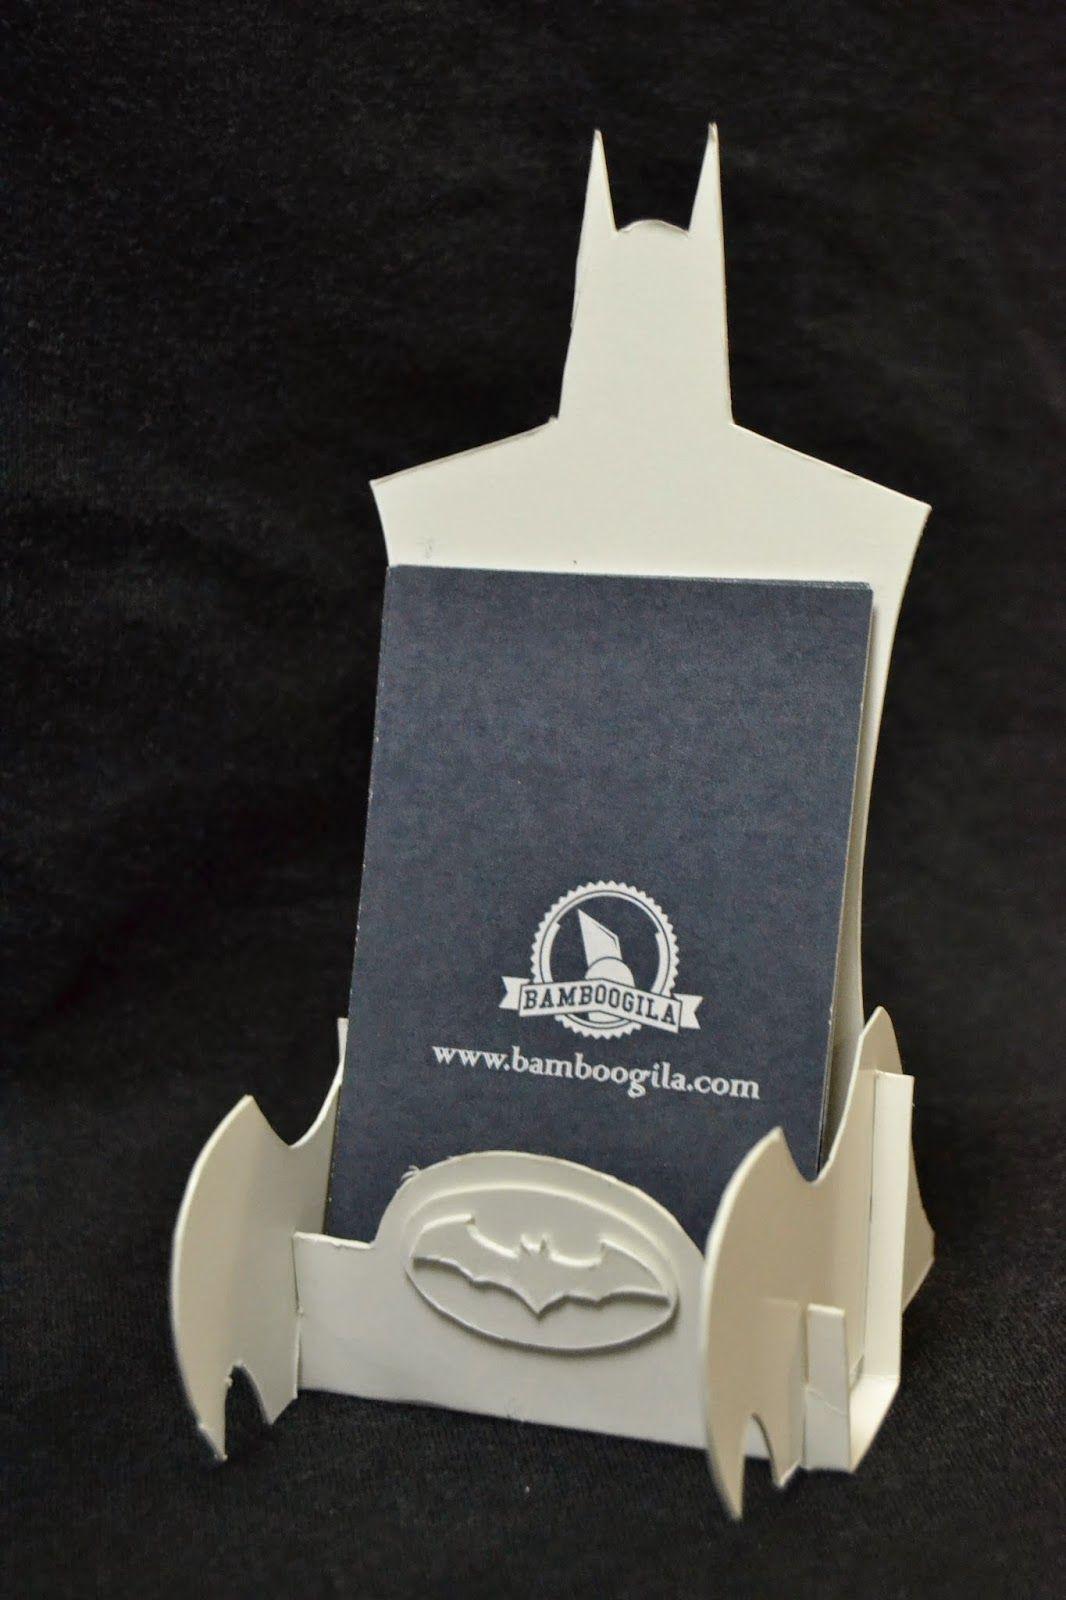 Batman Cardholder Papercraft | Crafty stuff | Paper models ... - photo#3